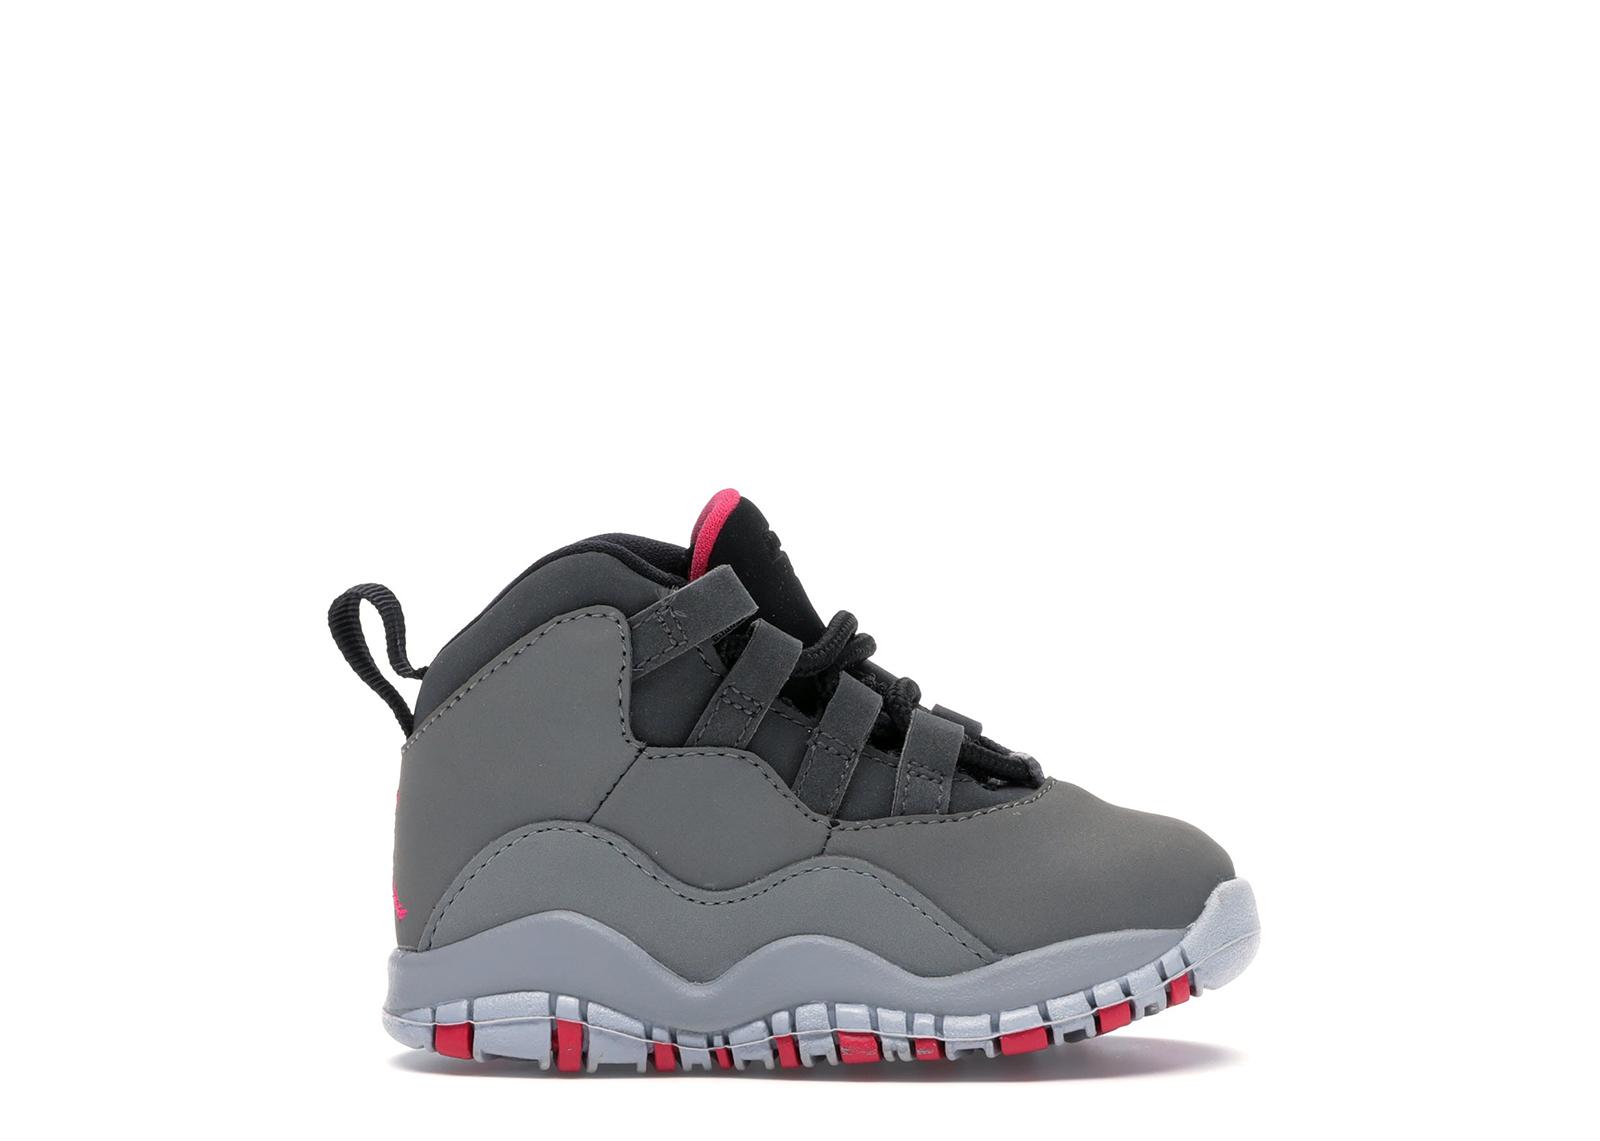 Jordan 10 Retro Rush Pink (TD) - 705416-006